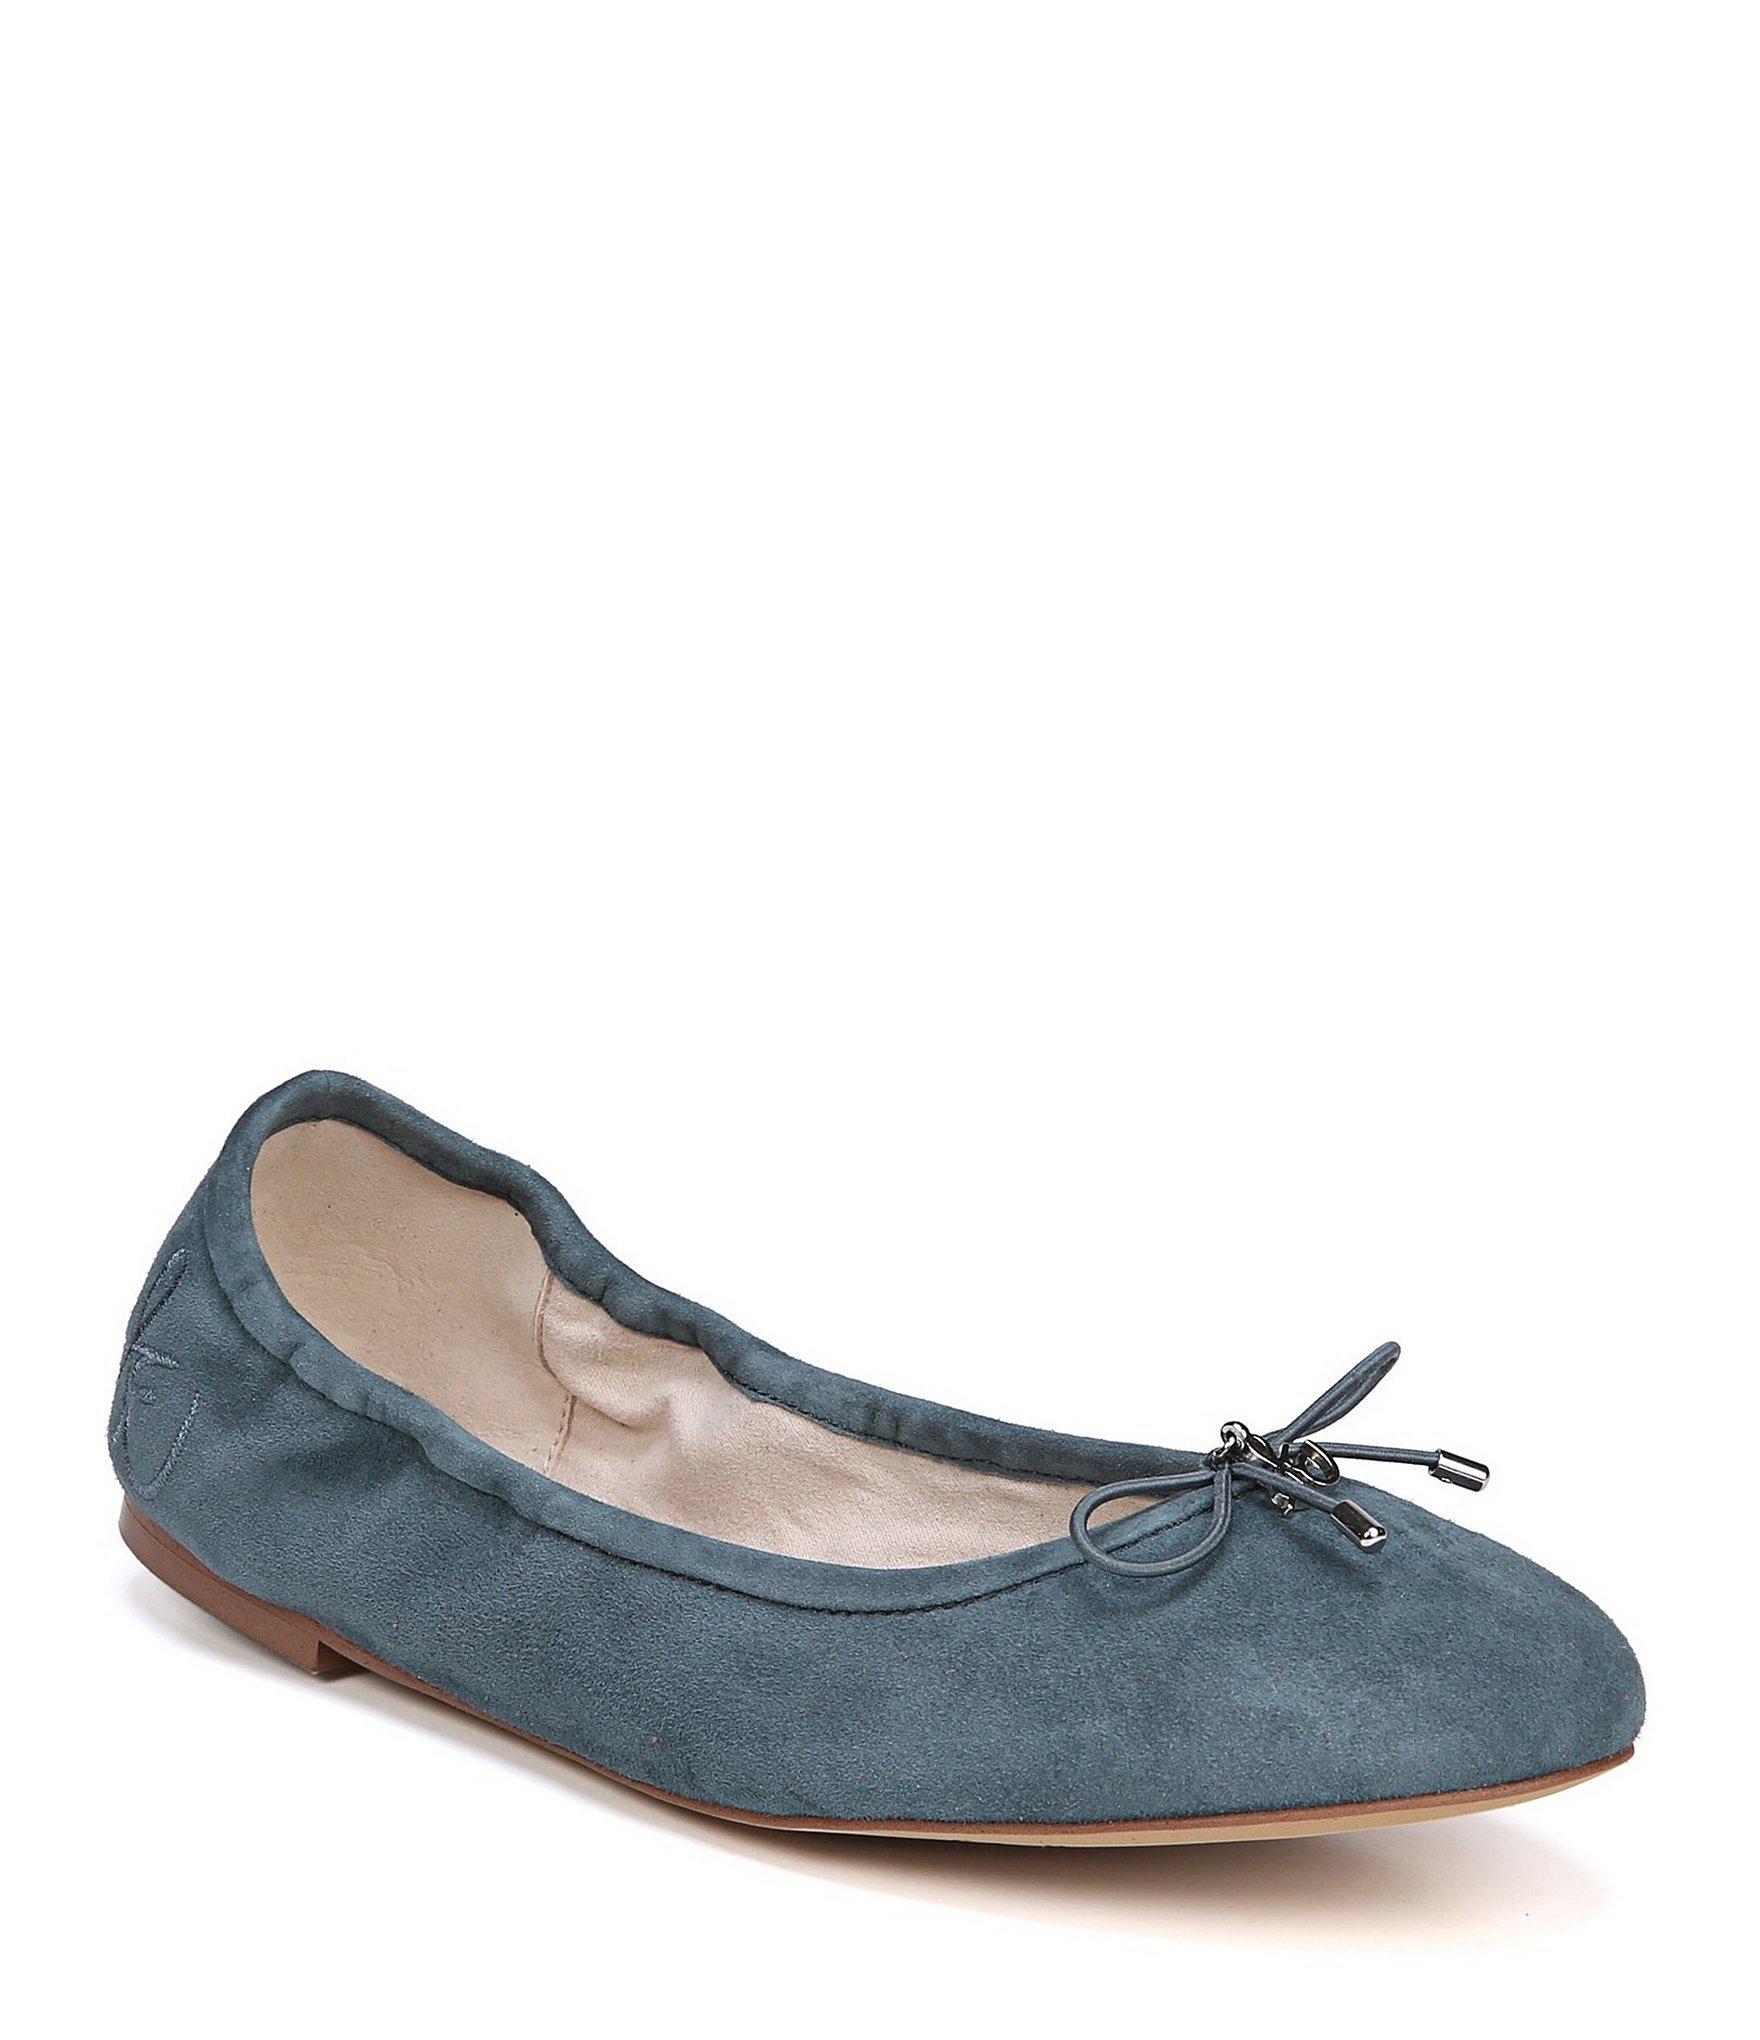 da94fec4eff687 Lyst - Sam Edelman Felicia Suede Ballet Flats in Blue